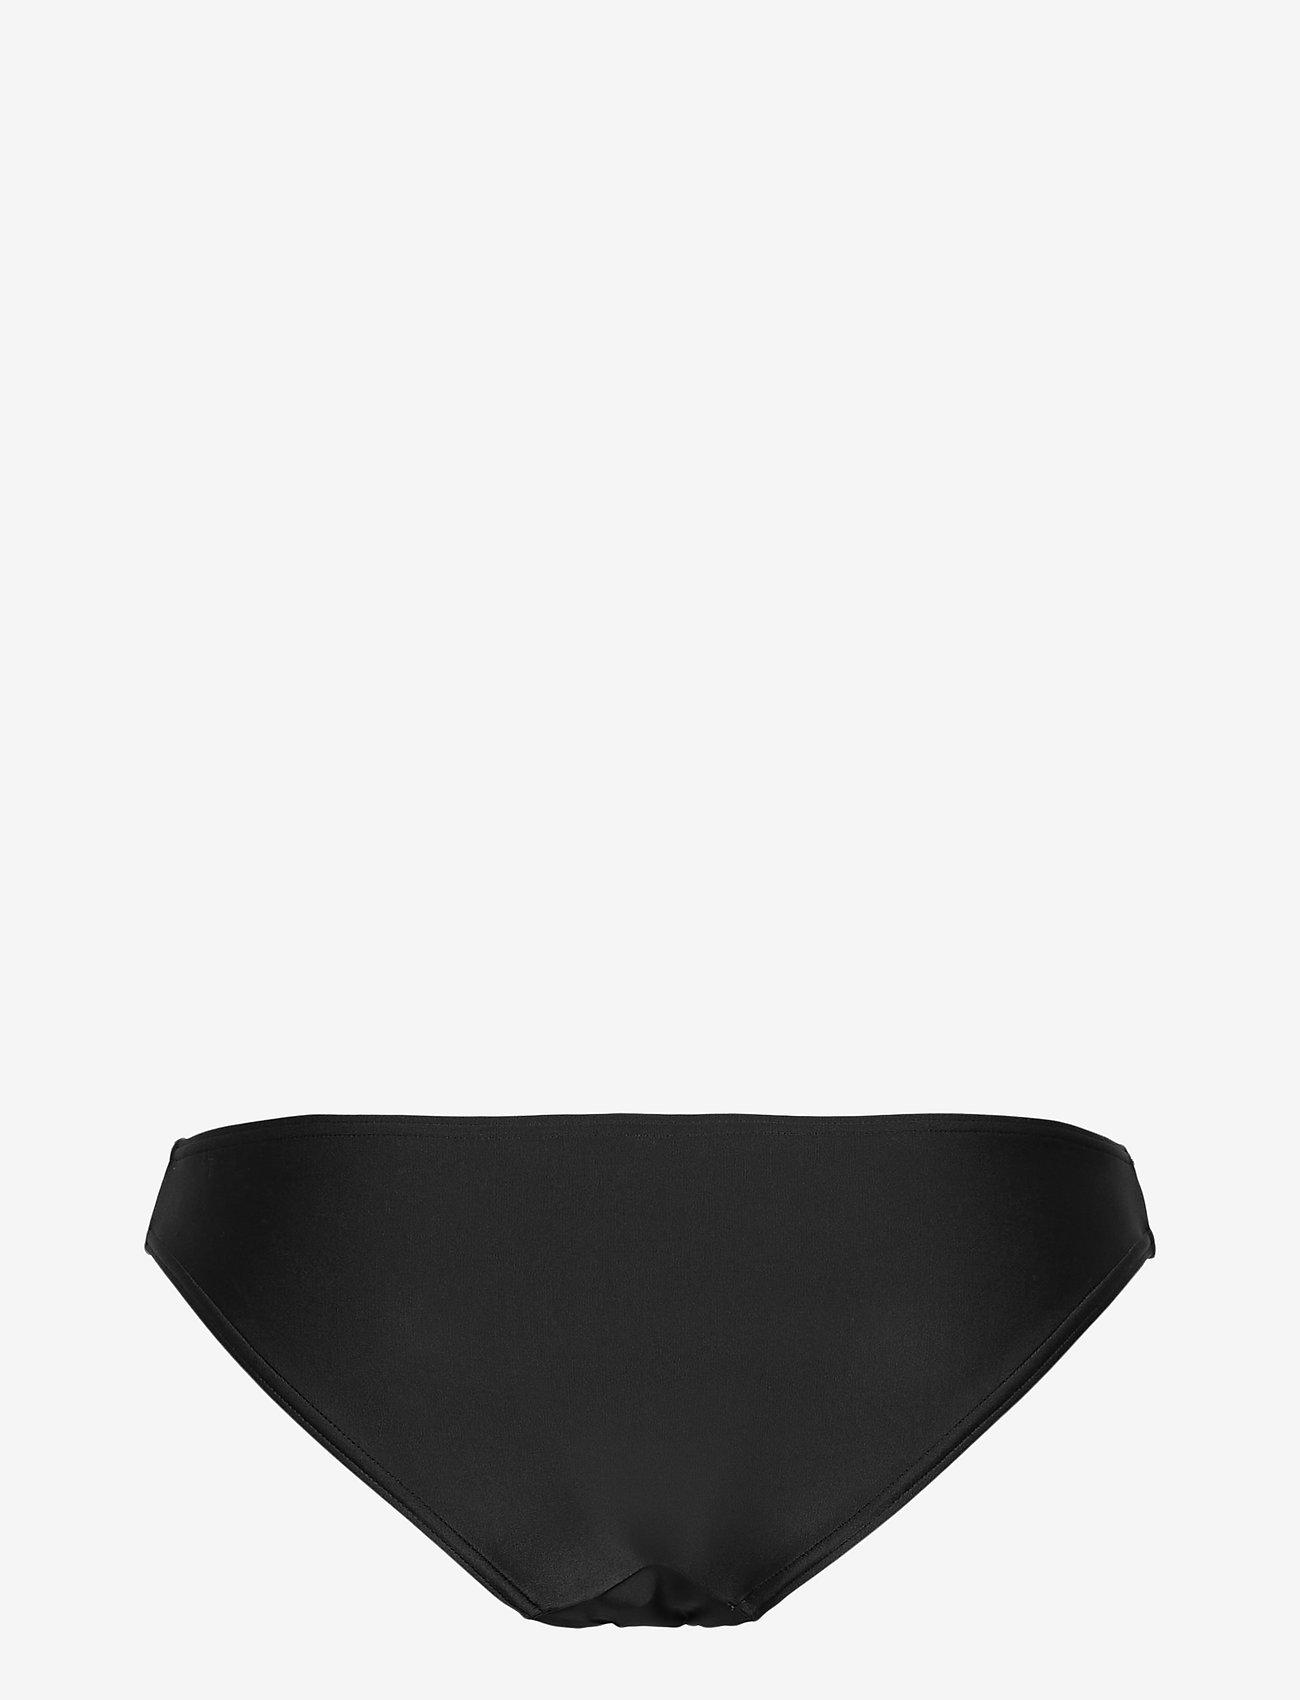 Salming - Bayview, Brief - majtki bikini - black - 1